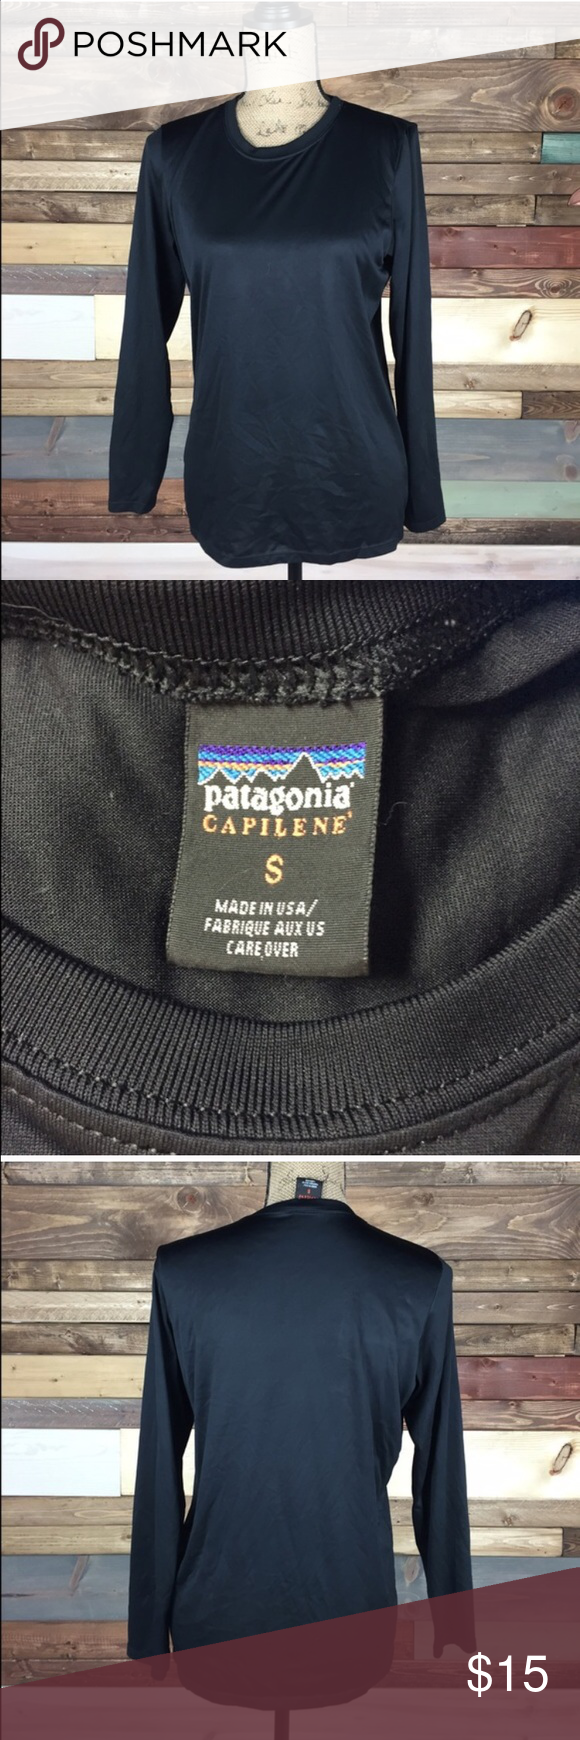 Patagonia Capilene Baselayer Patagonia Capilene Baselayer  Perfect layering piece for winter activities, stay warm.   #patagonia #baselayer #capilene #woodsnap Patagonia Tops Tees - Long Sleeve